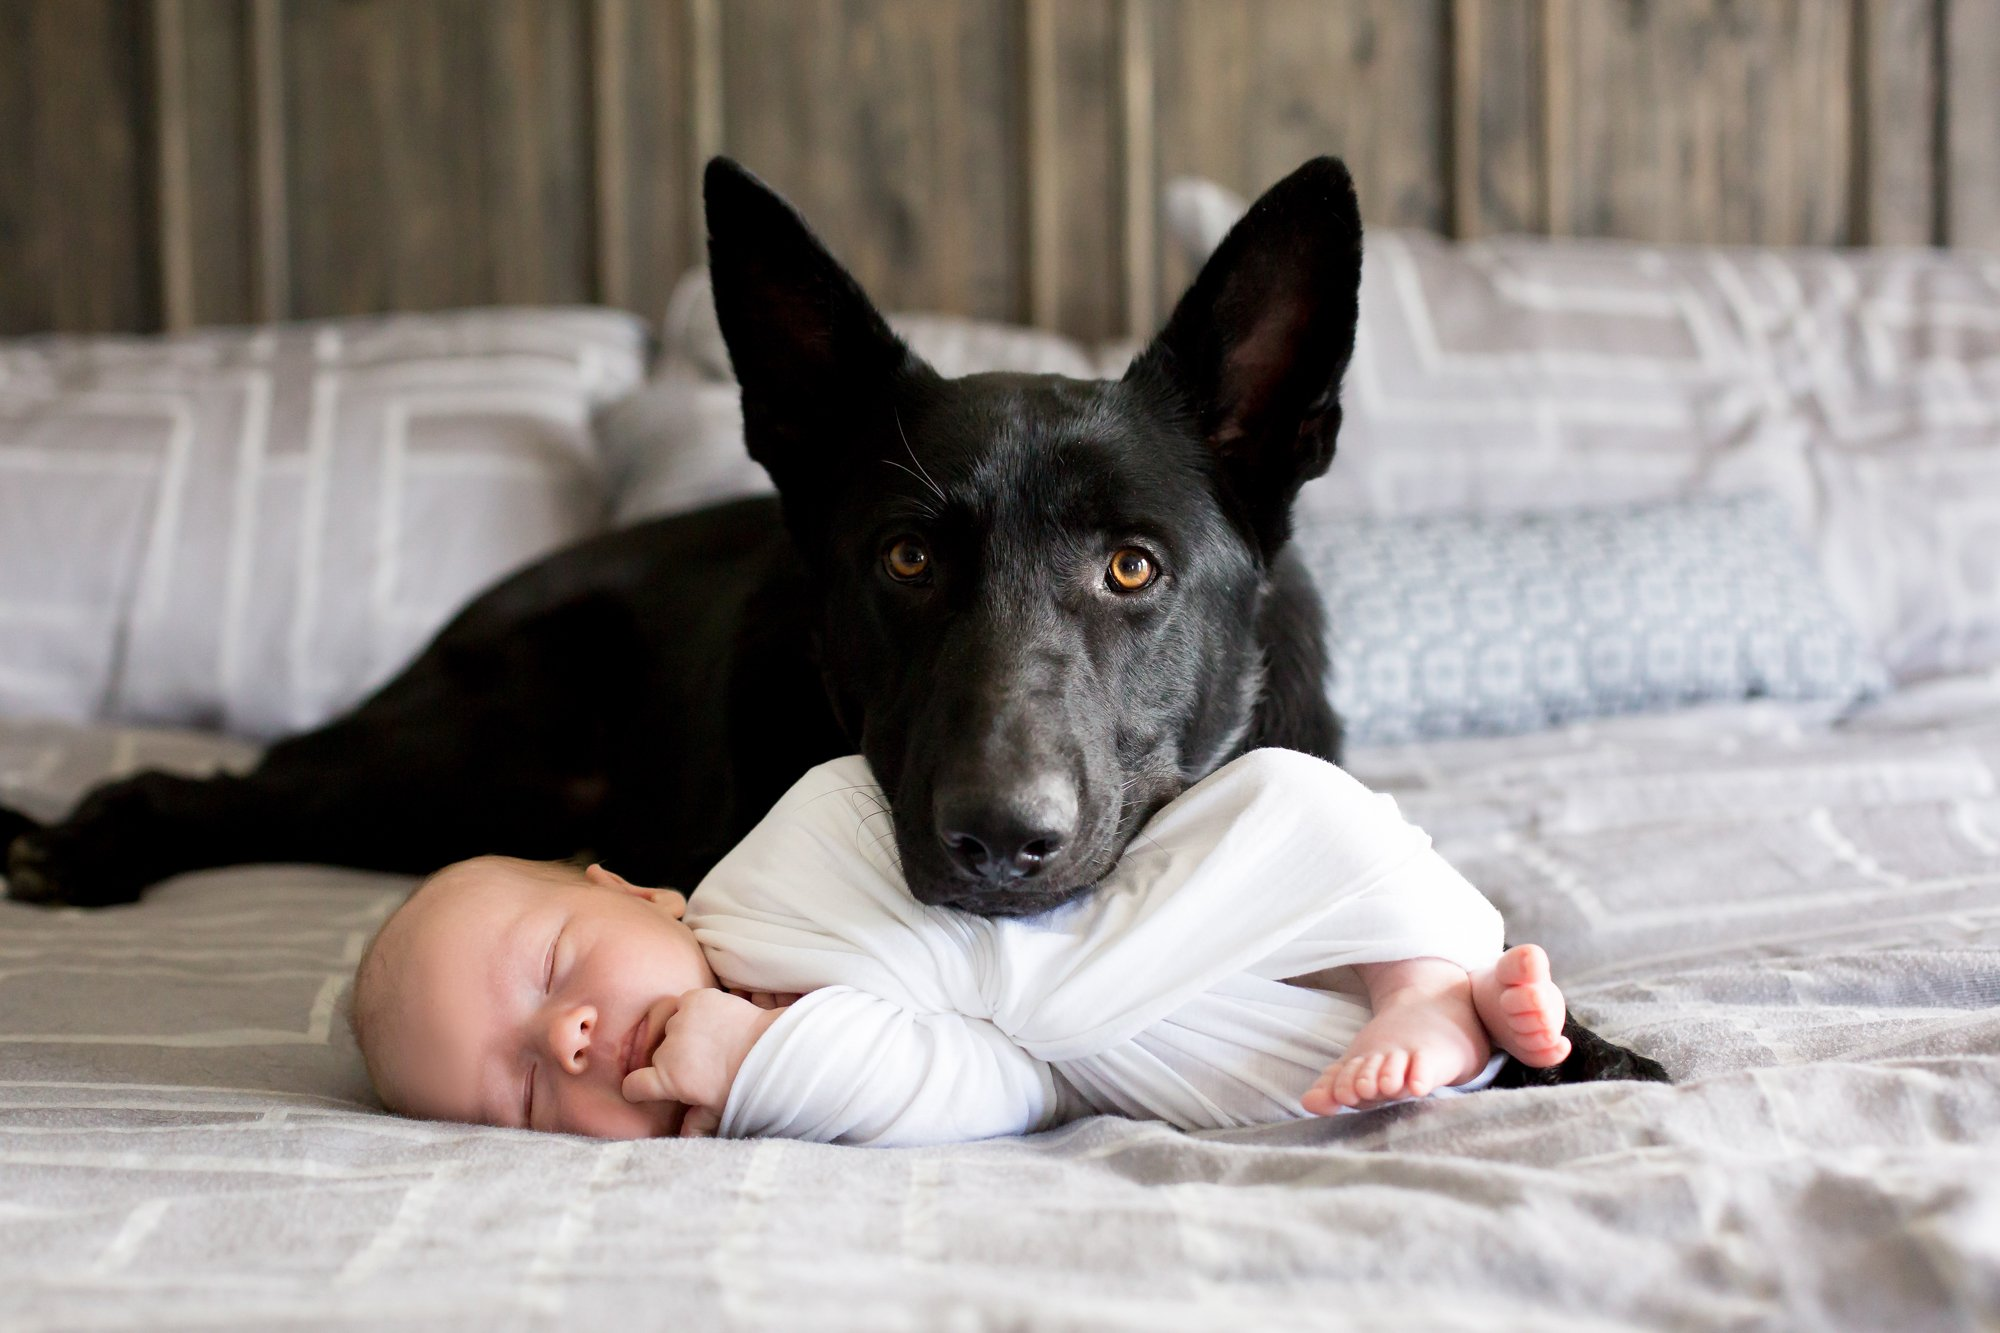 A black german shepherd laying with a newborn baby